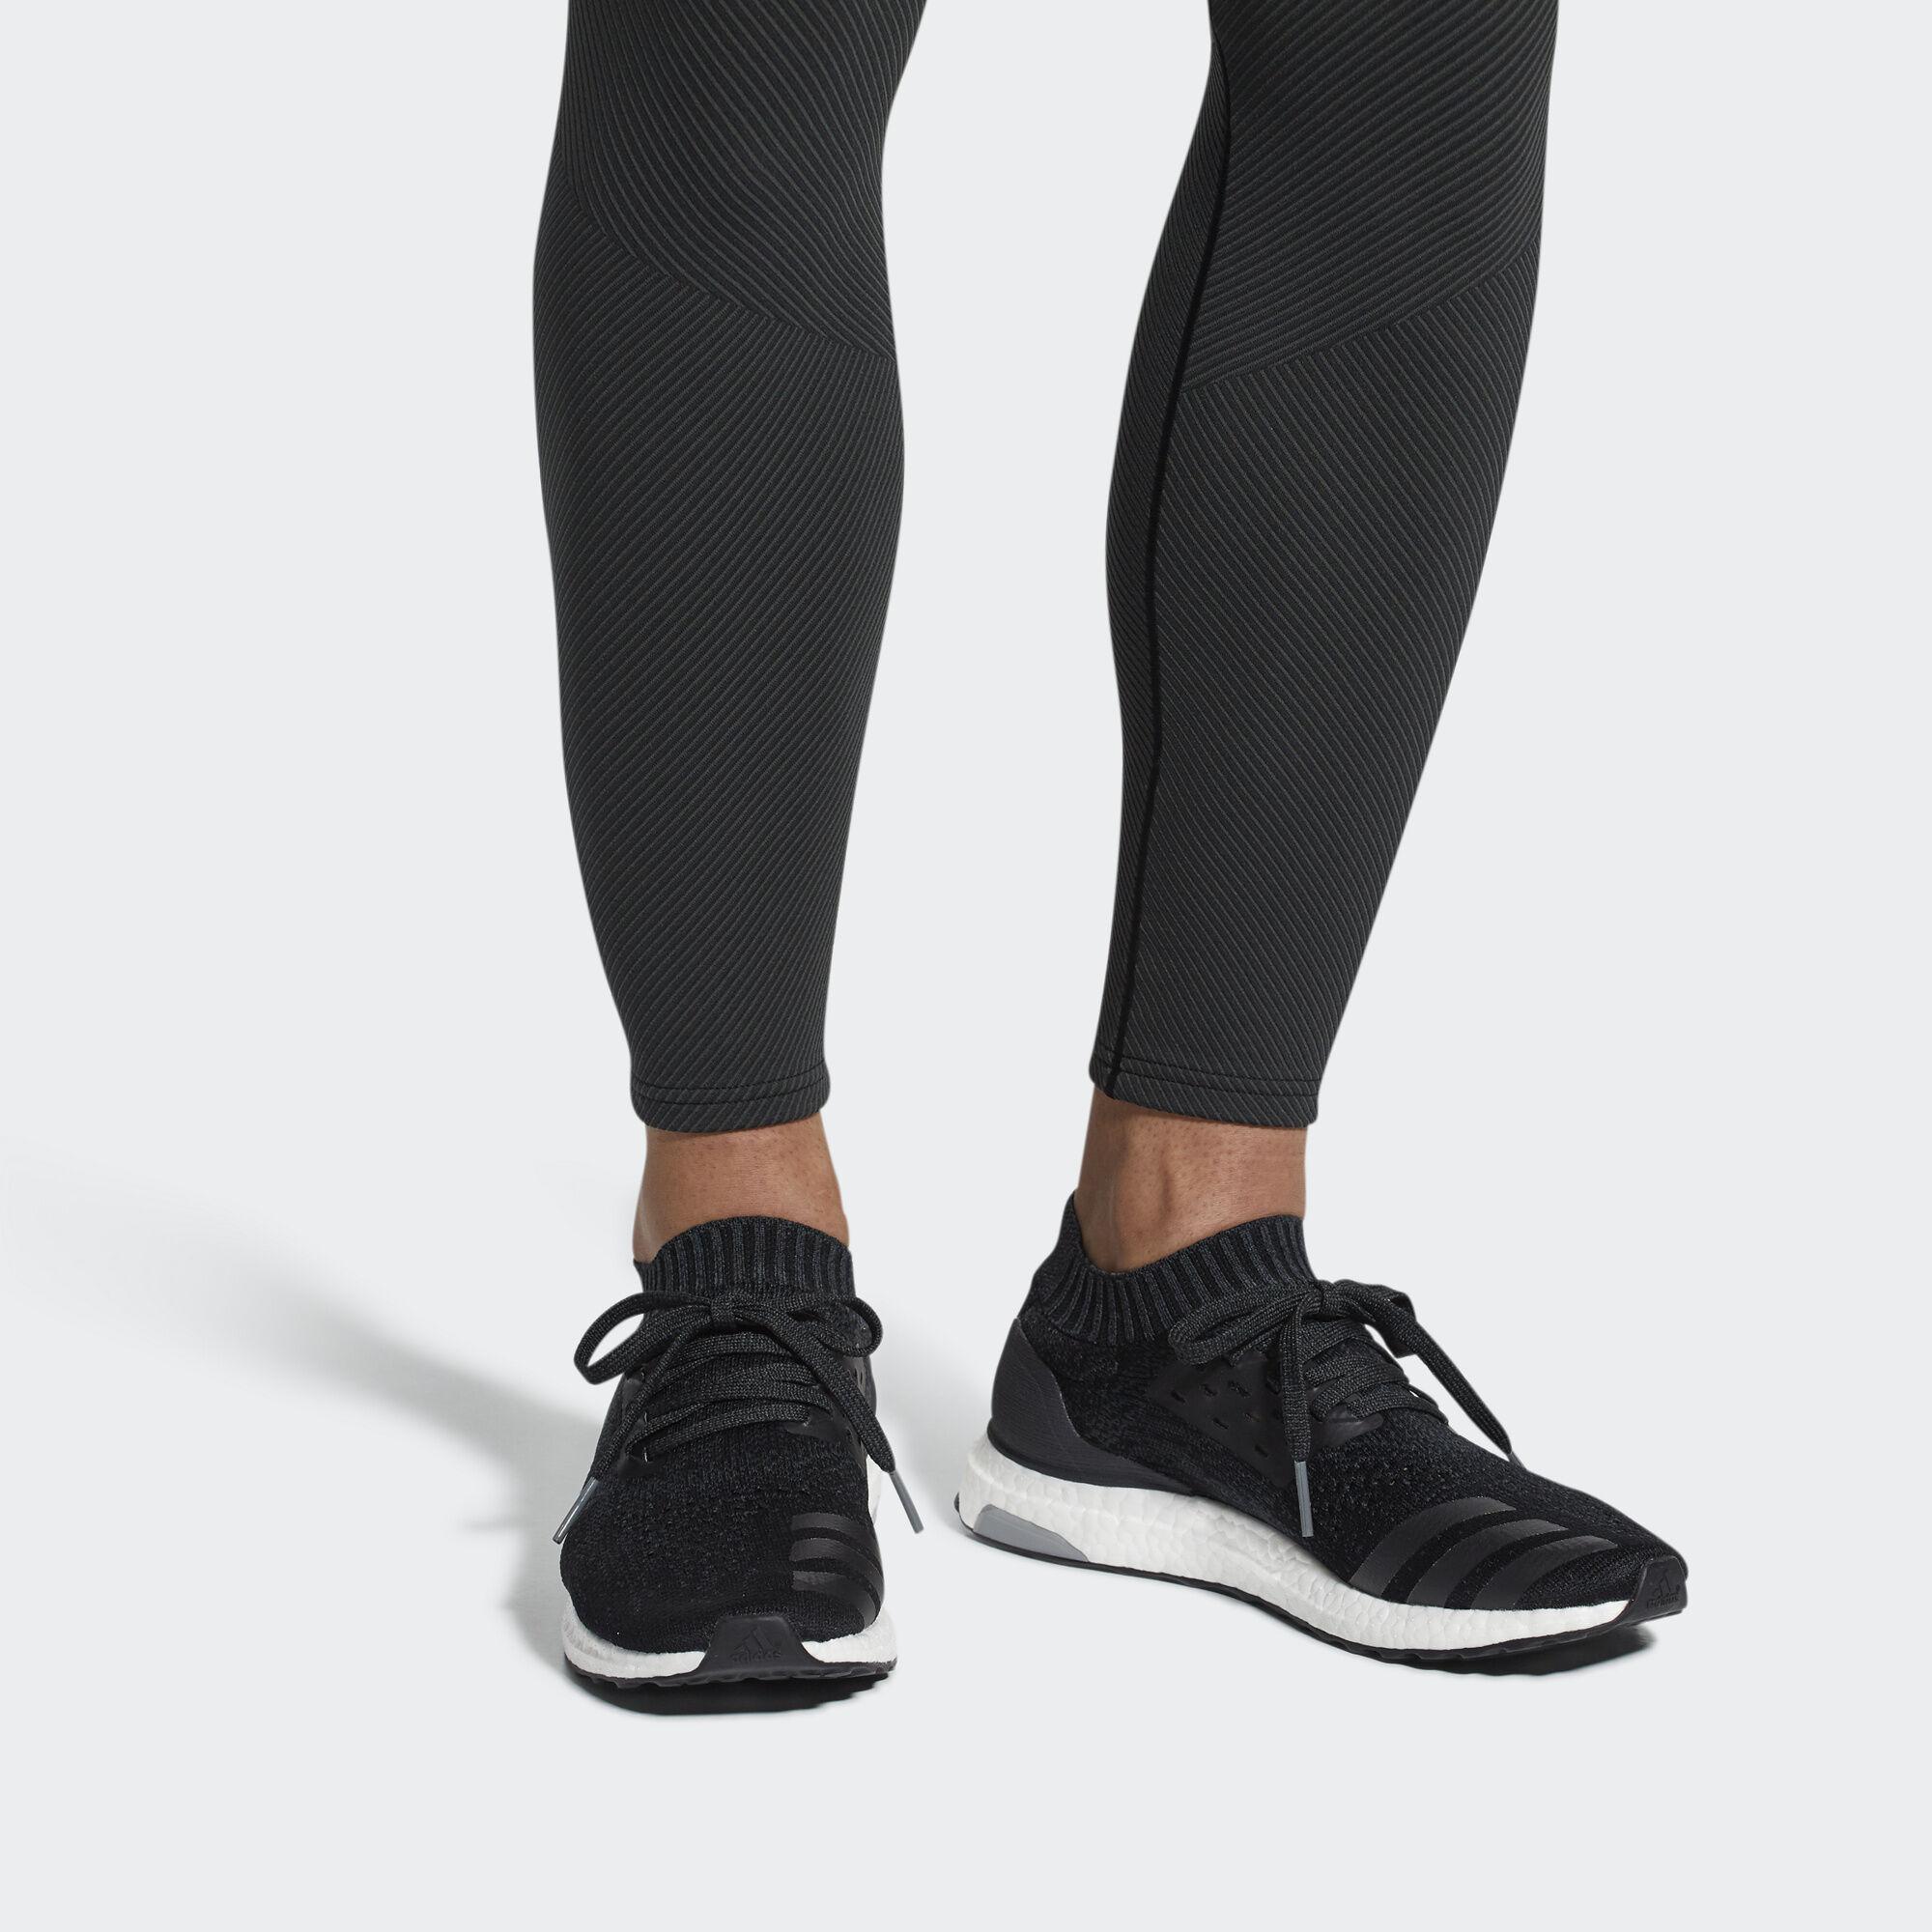 d18d989da75e94 adidas Ultraboost Uncaged Shoes - White